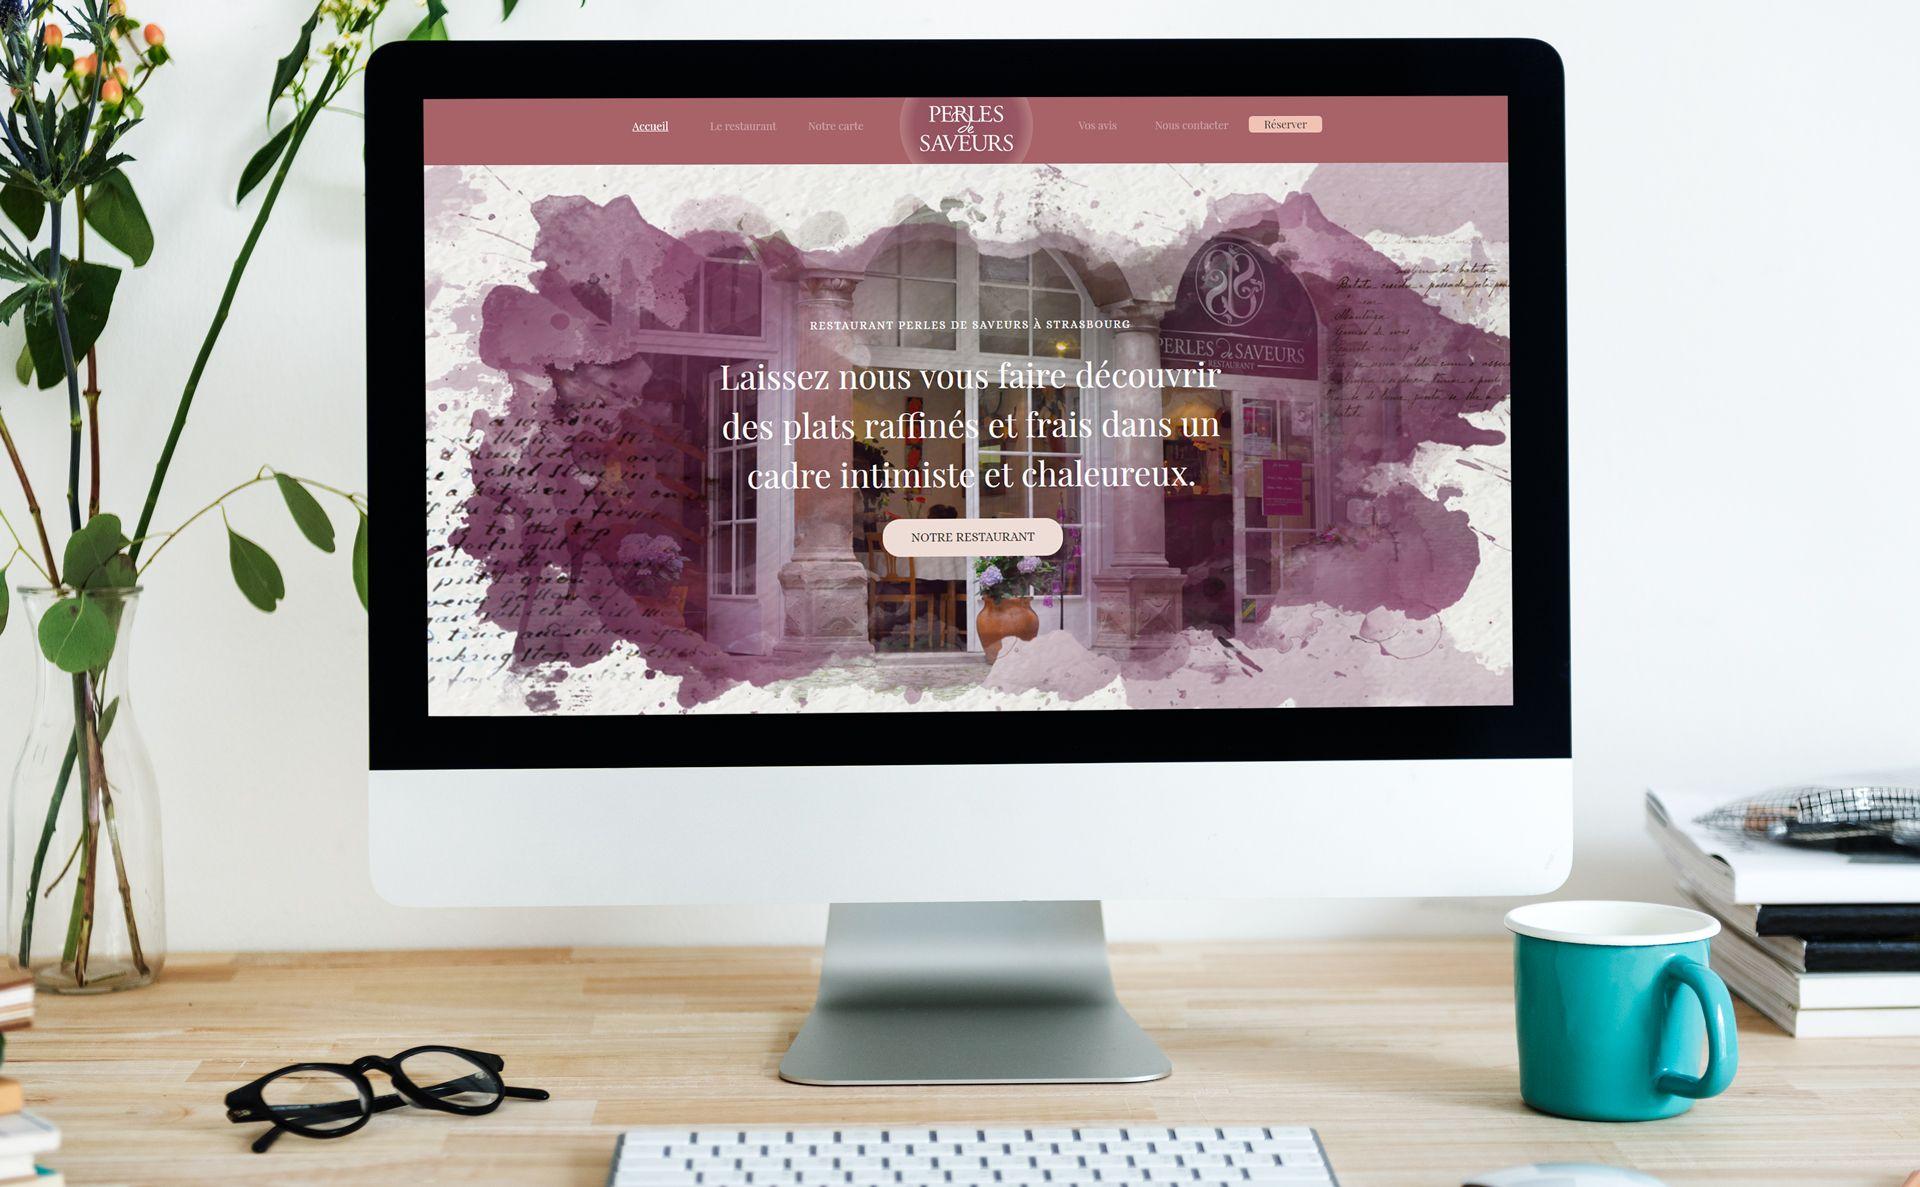 Site web 2019 Perles de Saveurs